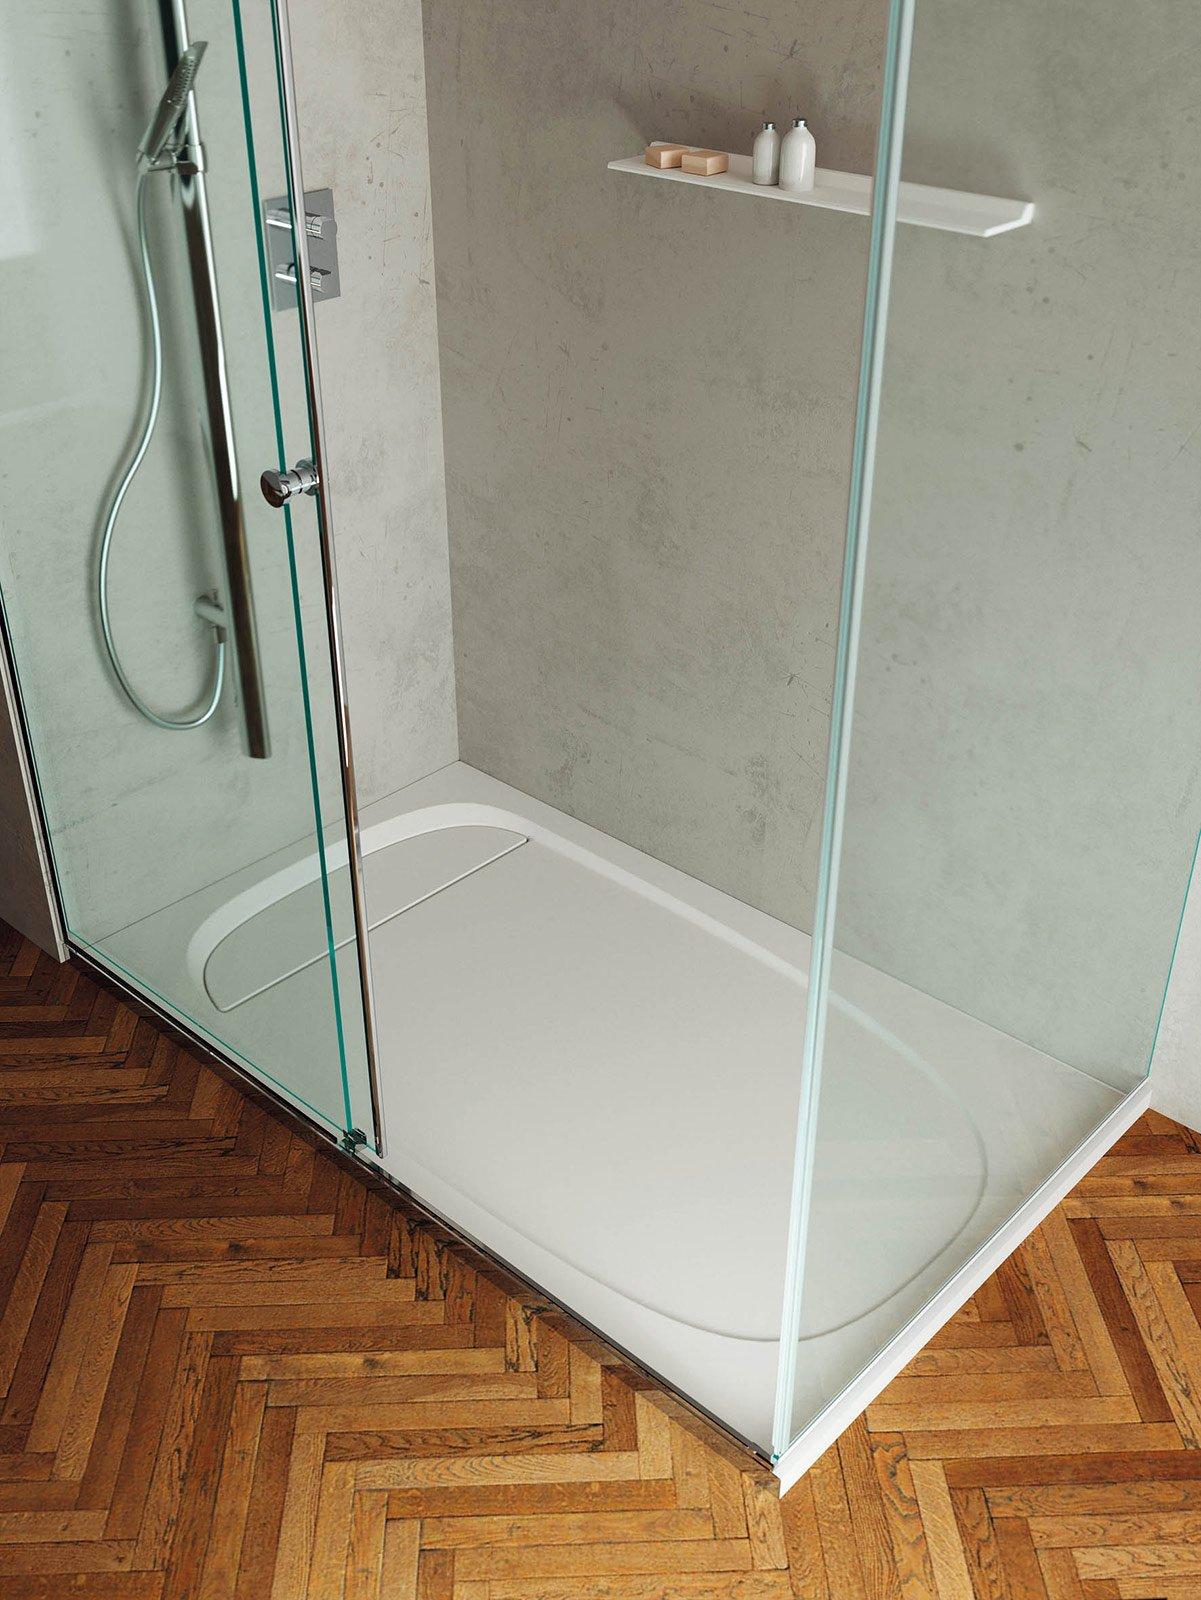 Doccia teuco prezzi discover the teuco shower tray that - Piatto doccia marmogres ...